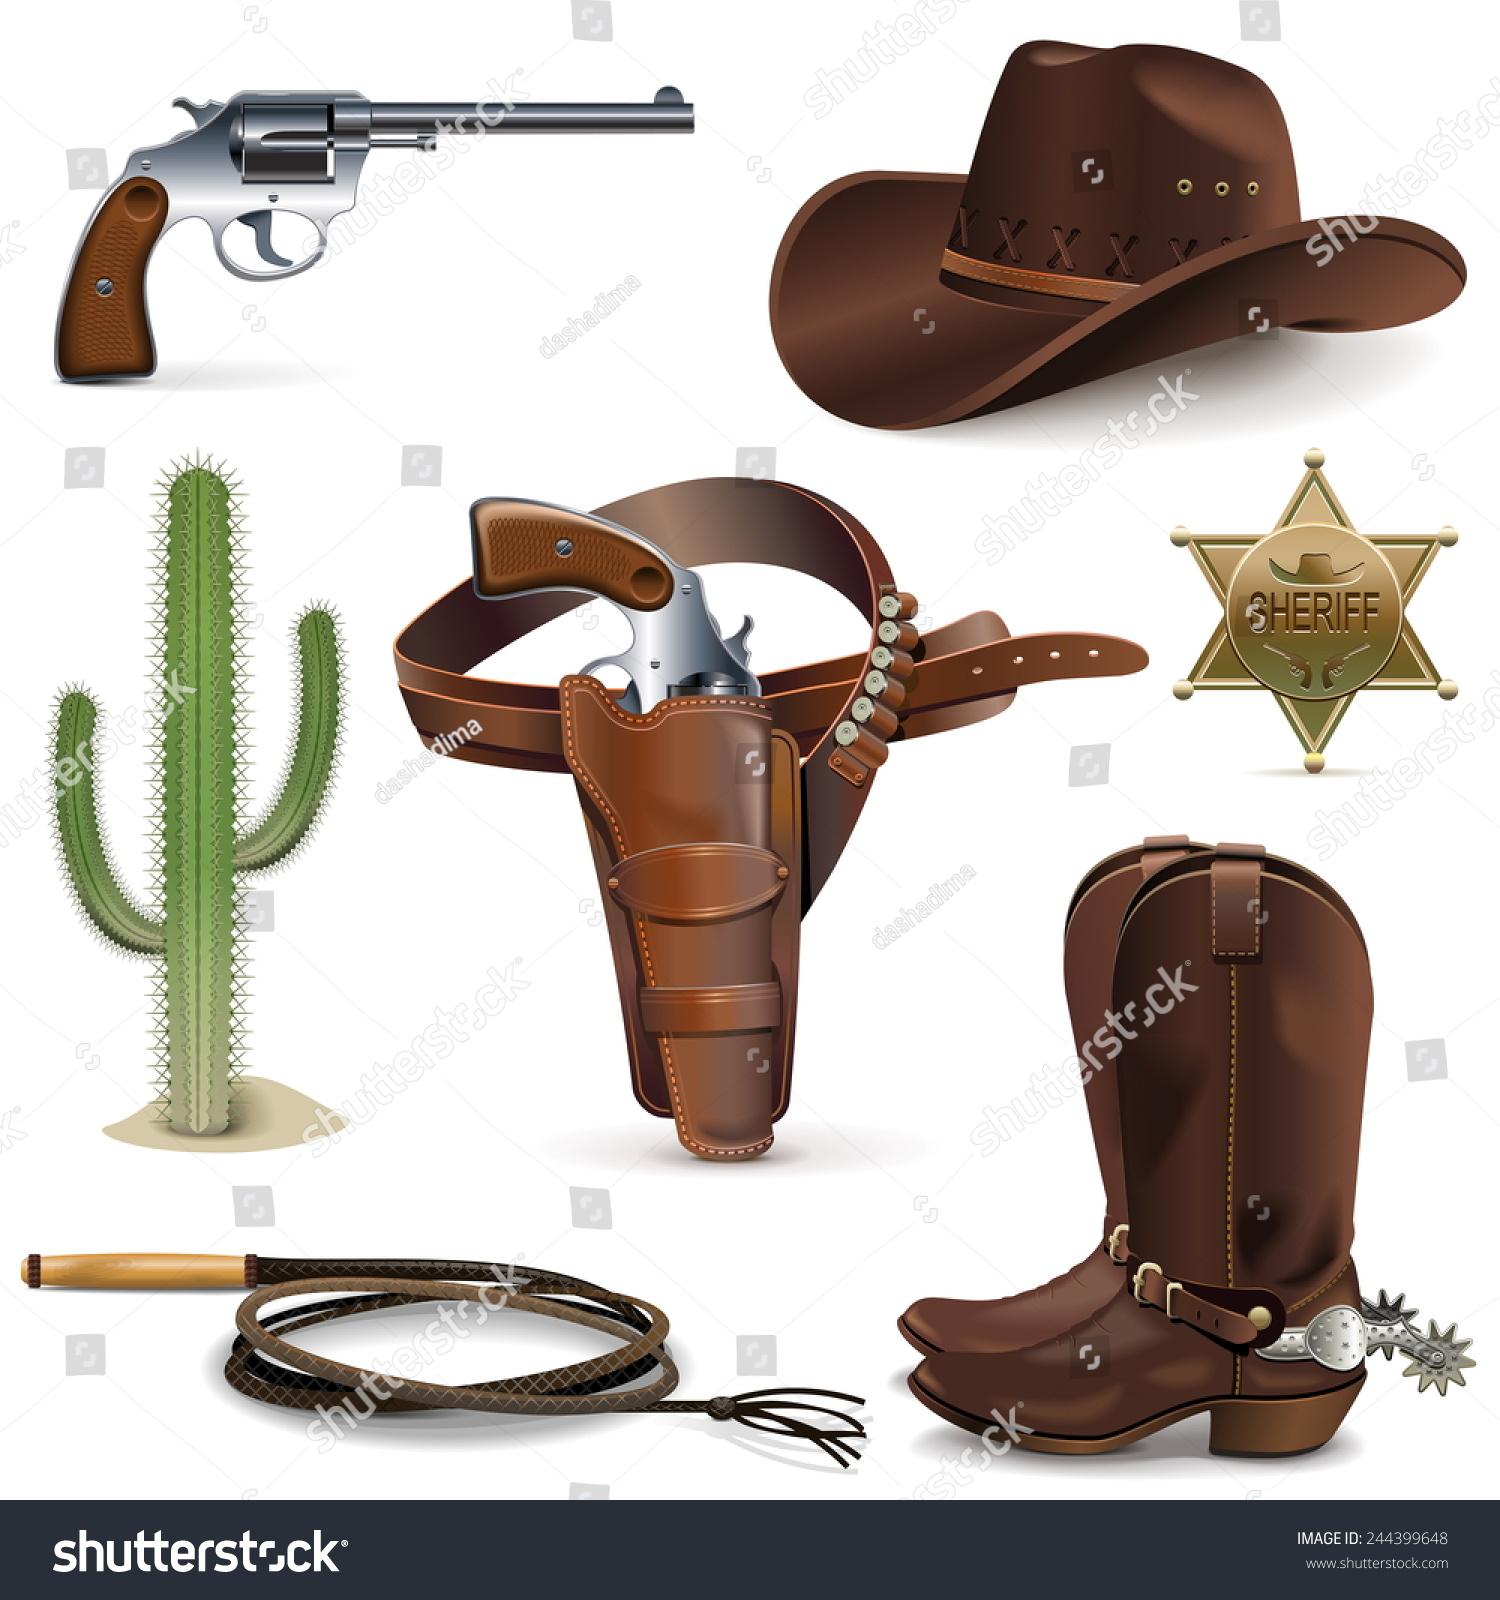 Vector Cowboy Icons Stock-Vektorgrafik 244399648 – Shutterstock